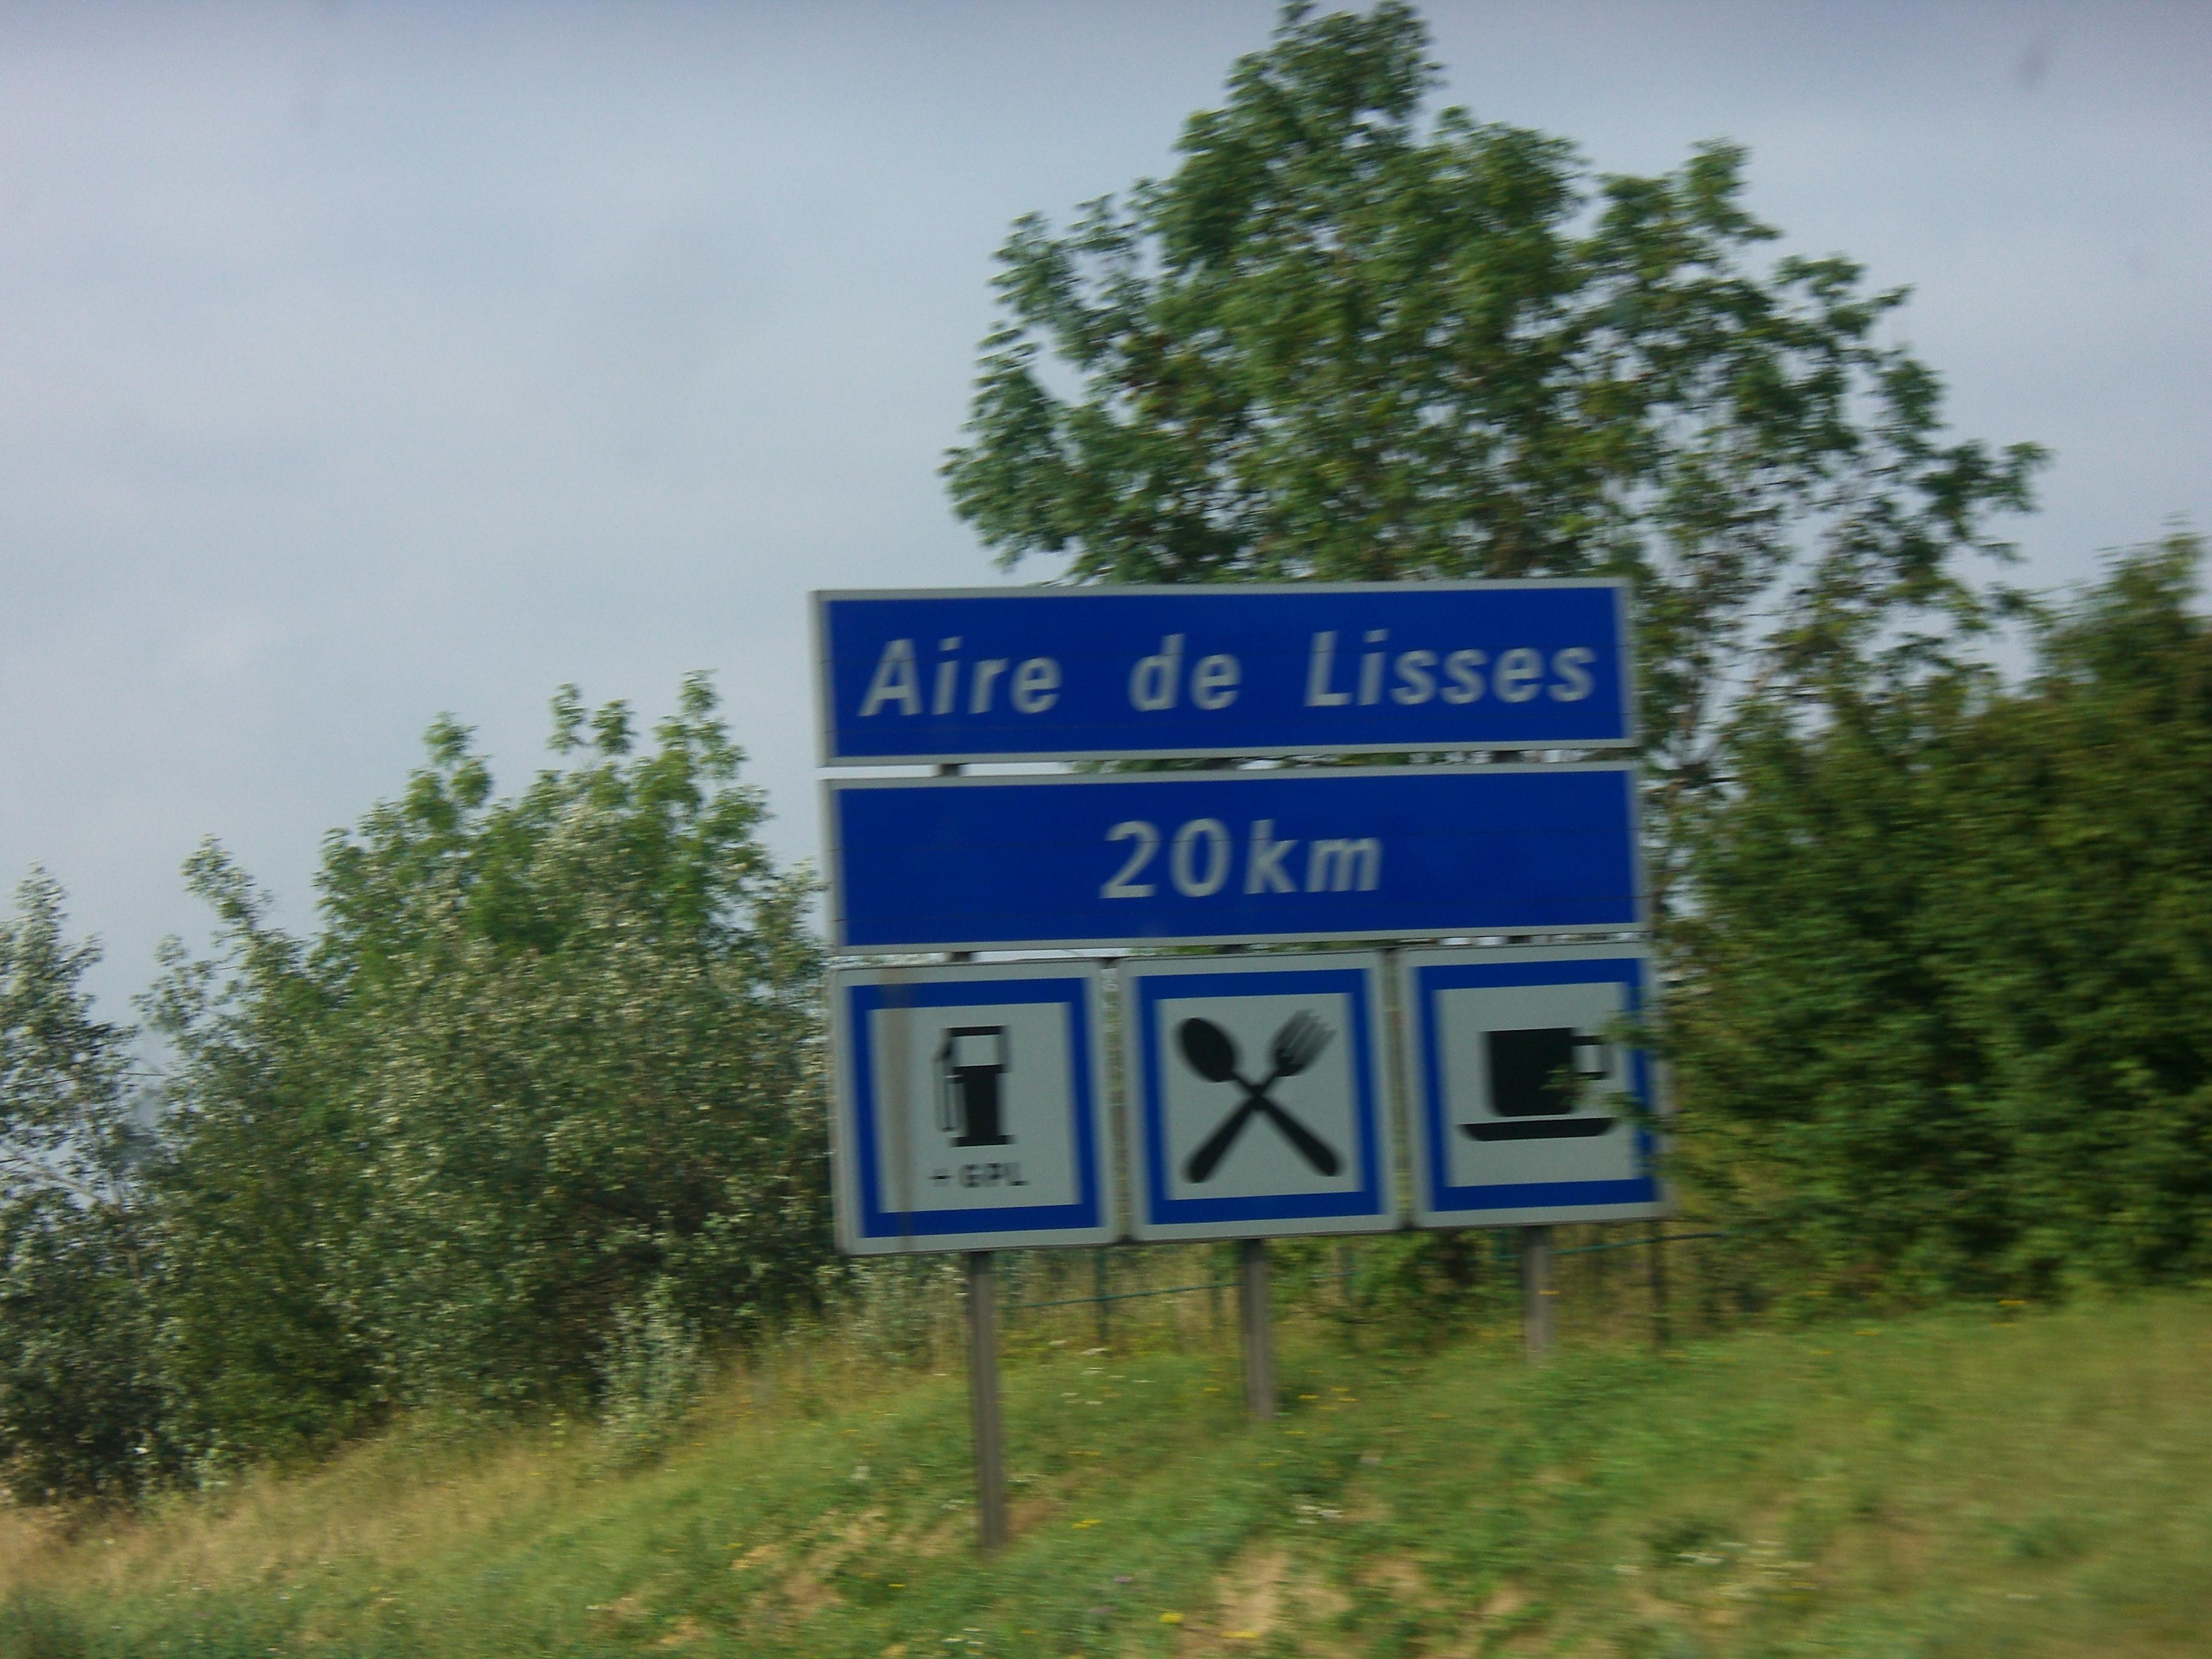 autoroute française a6 (aires) | wikisara | fandom poweredwikia